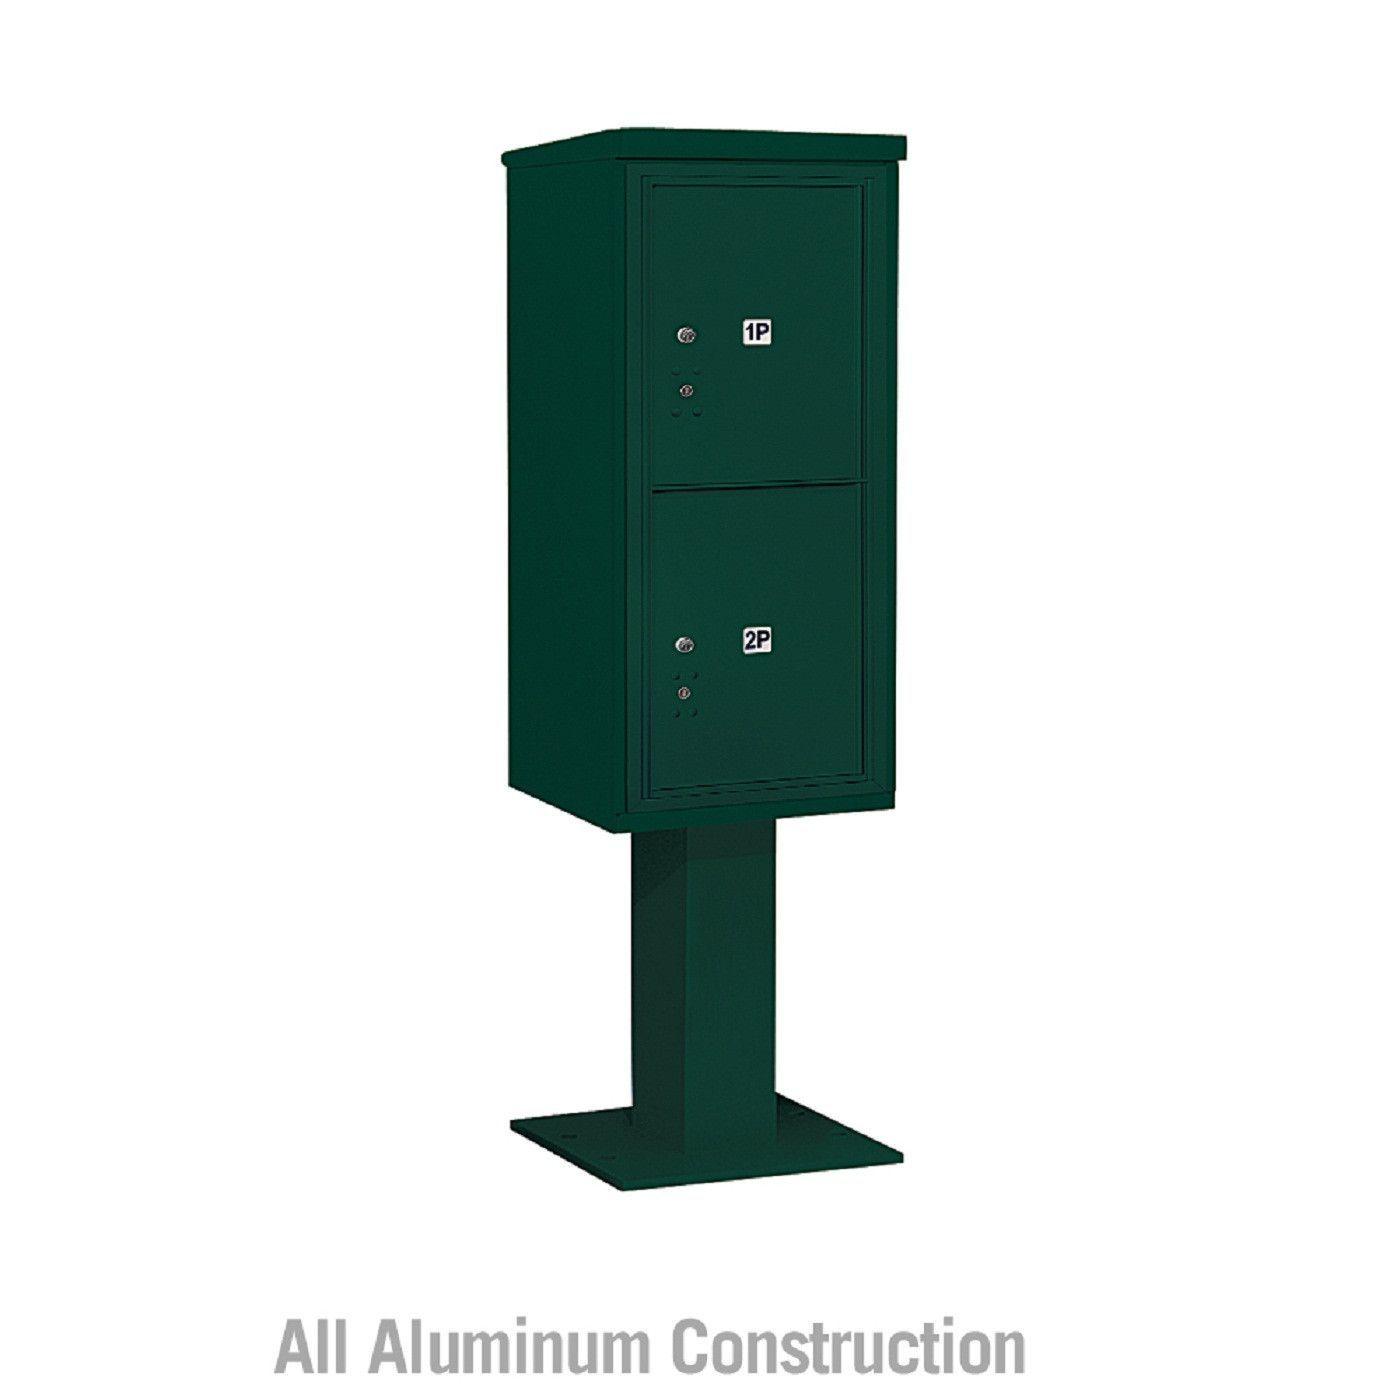 Salsbury Industries 4C+ Horizontal Mailbox Unit 10 Door Single Column Front Loading Private Access